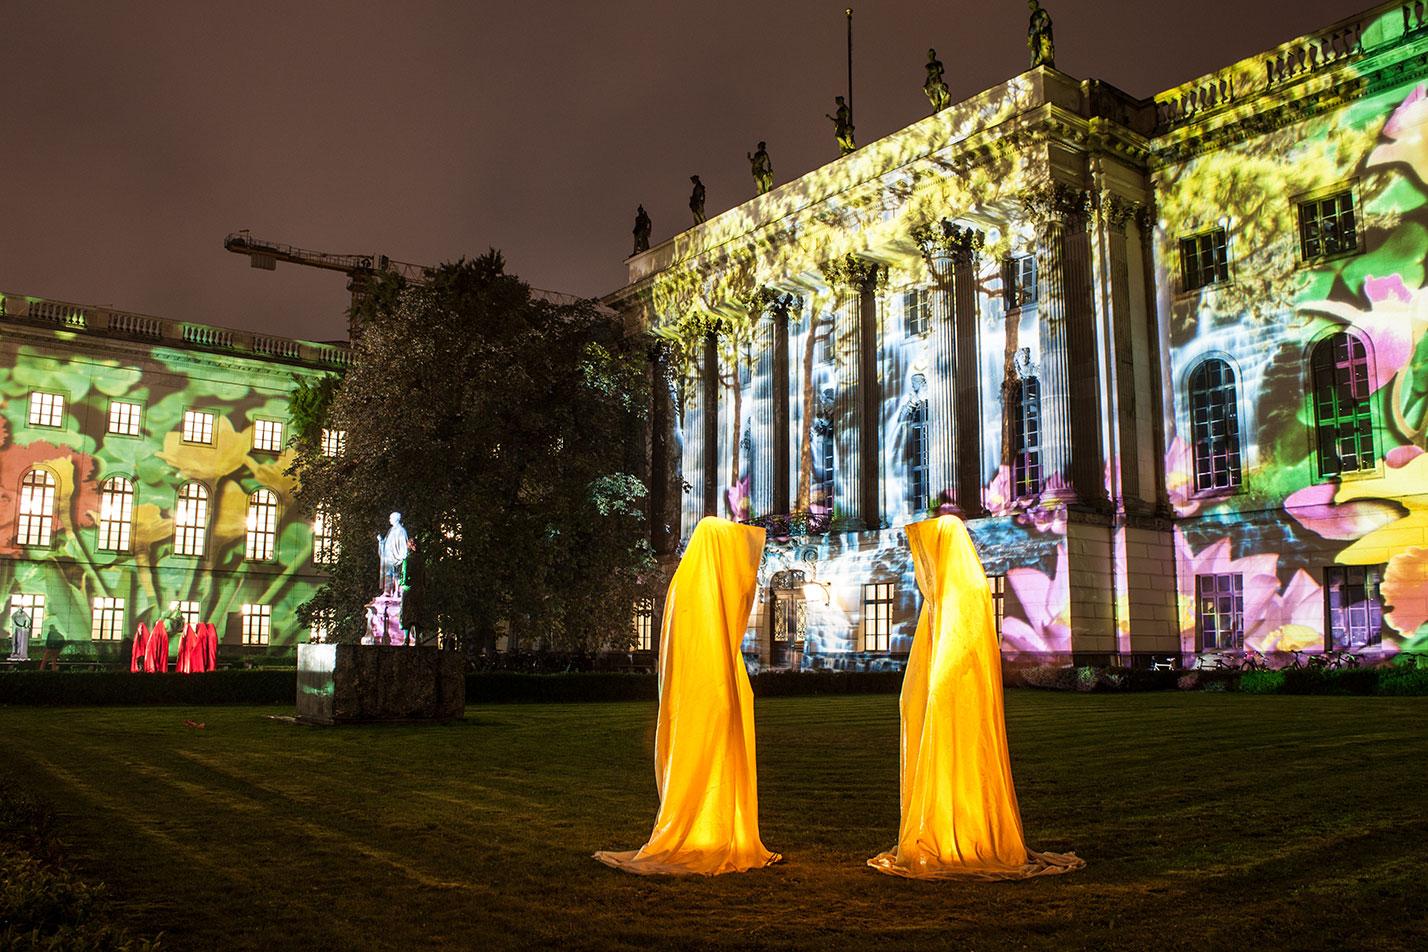 festival-of-lights-berlin-humbold-university-light-art-festival-contemporary-fine-art-design-show-guardiansof-time-manfred-kili-kielnhofer-sculpture-3576